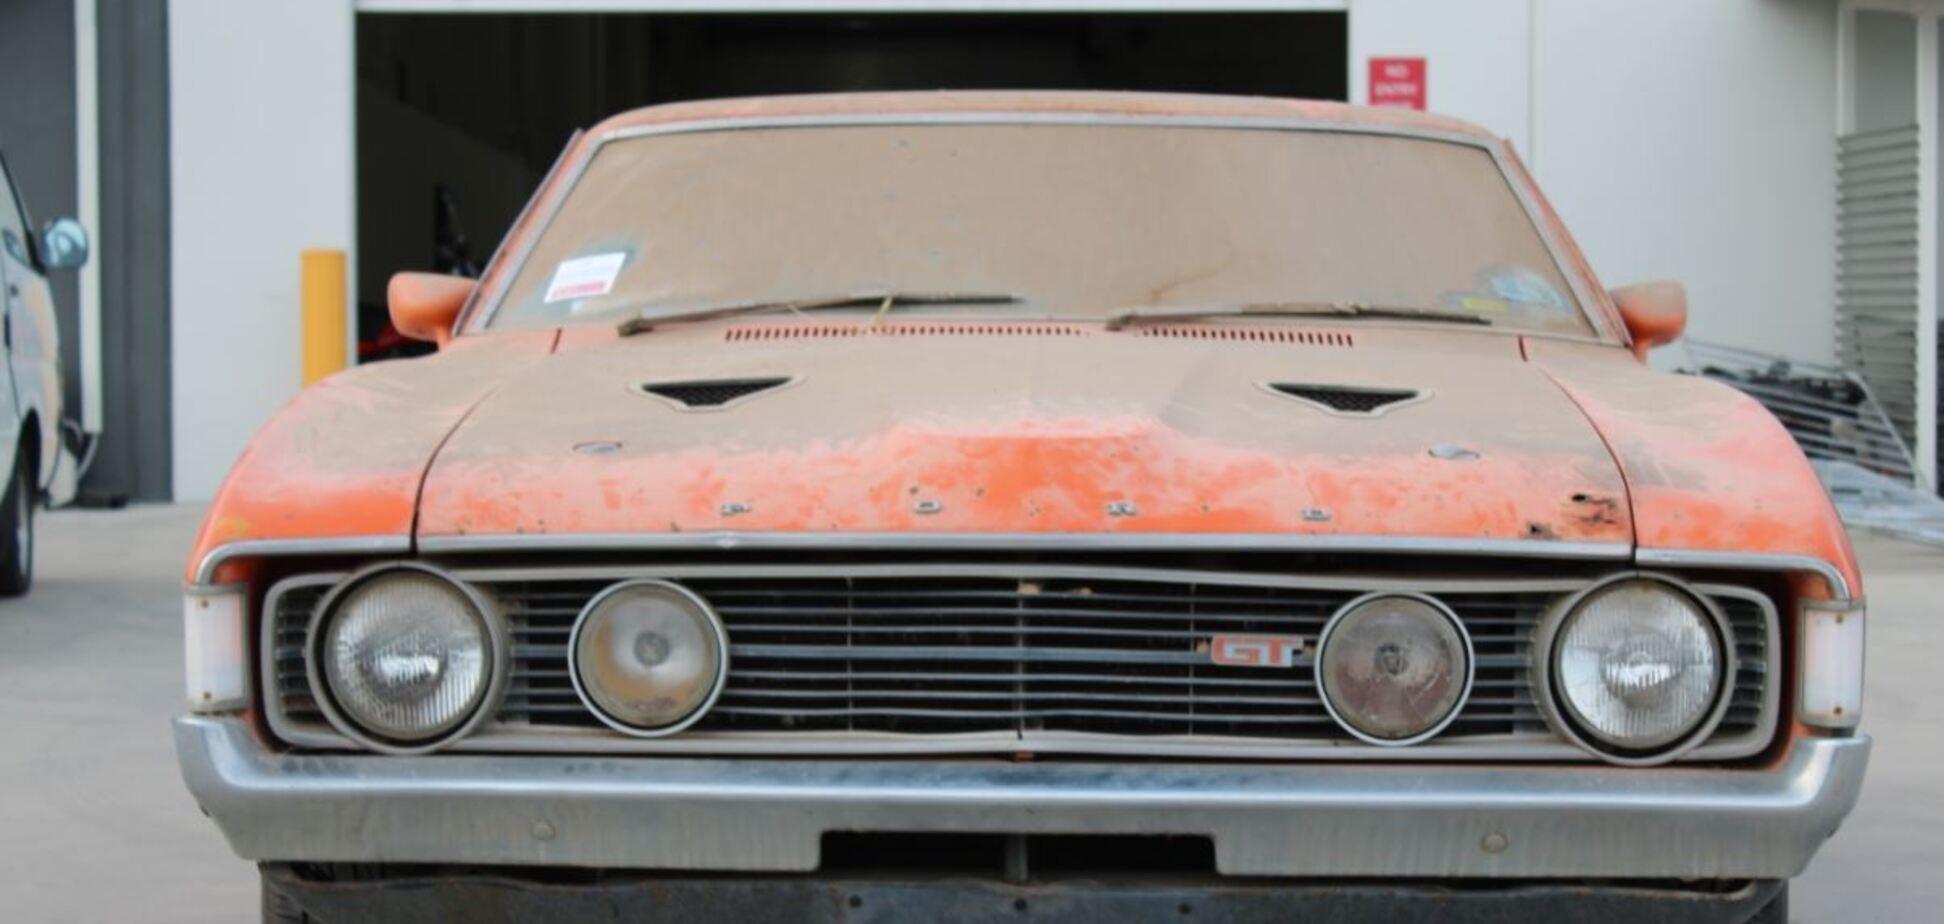 Ржавый Ford, который простоял в гараже 32 года, продали за 6 млн грн